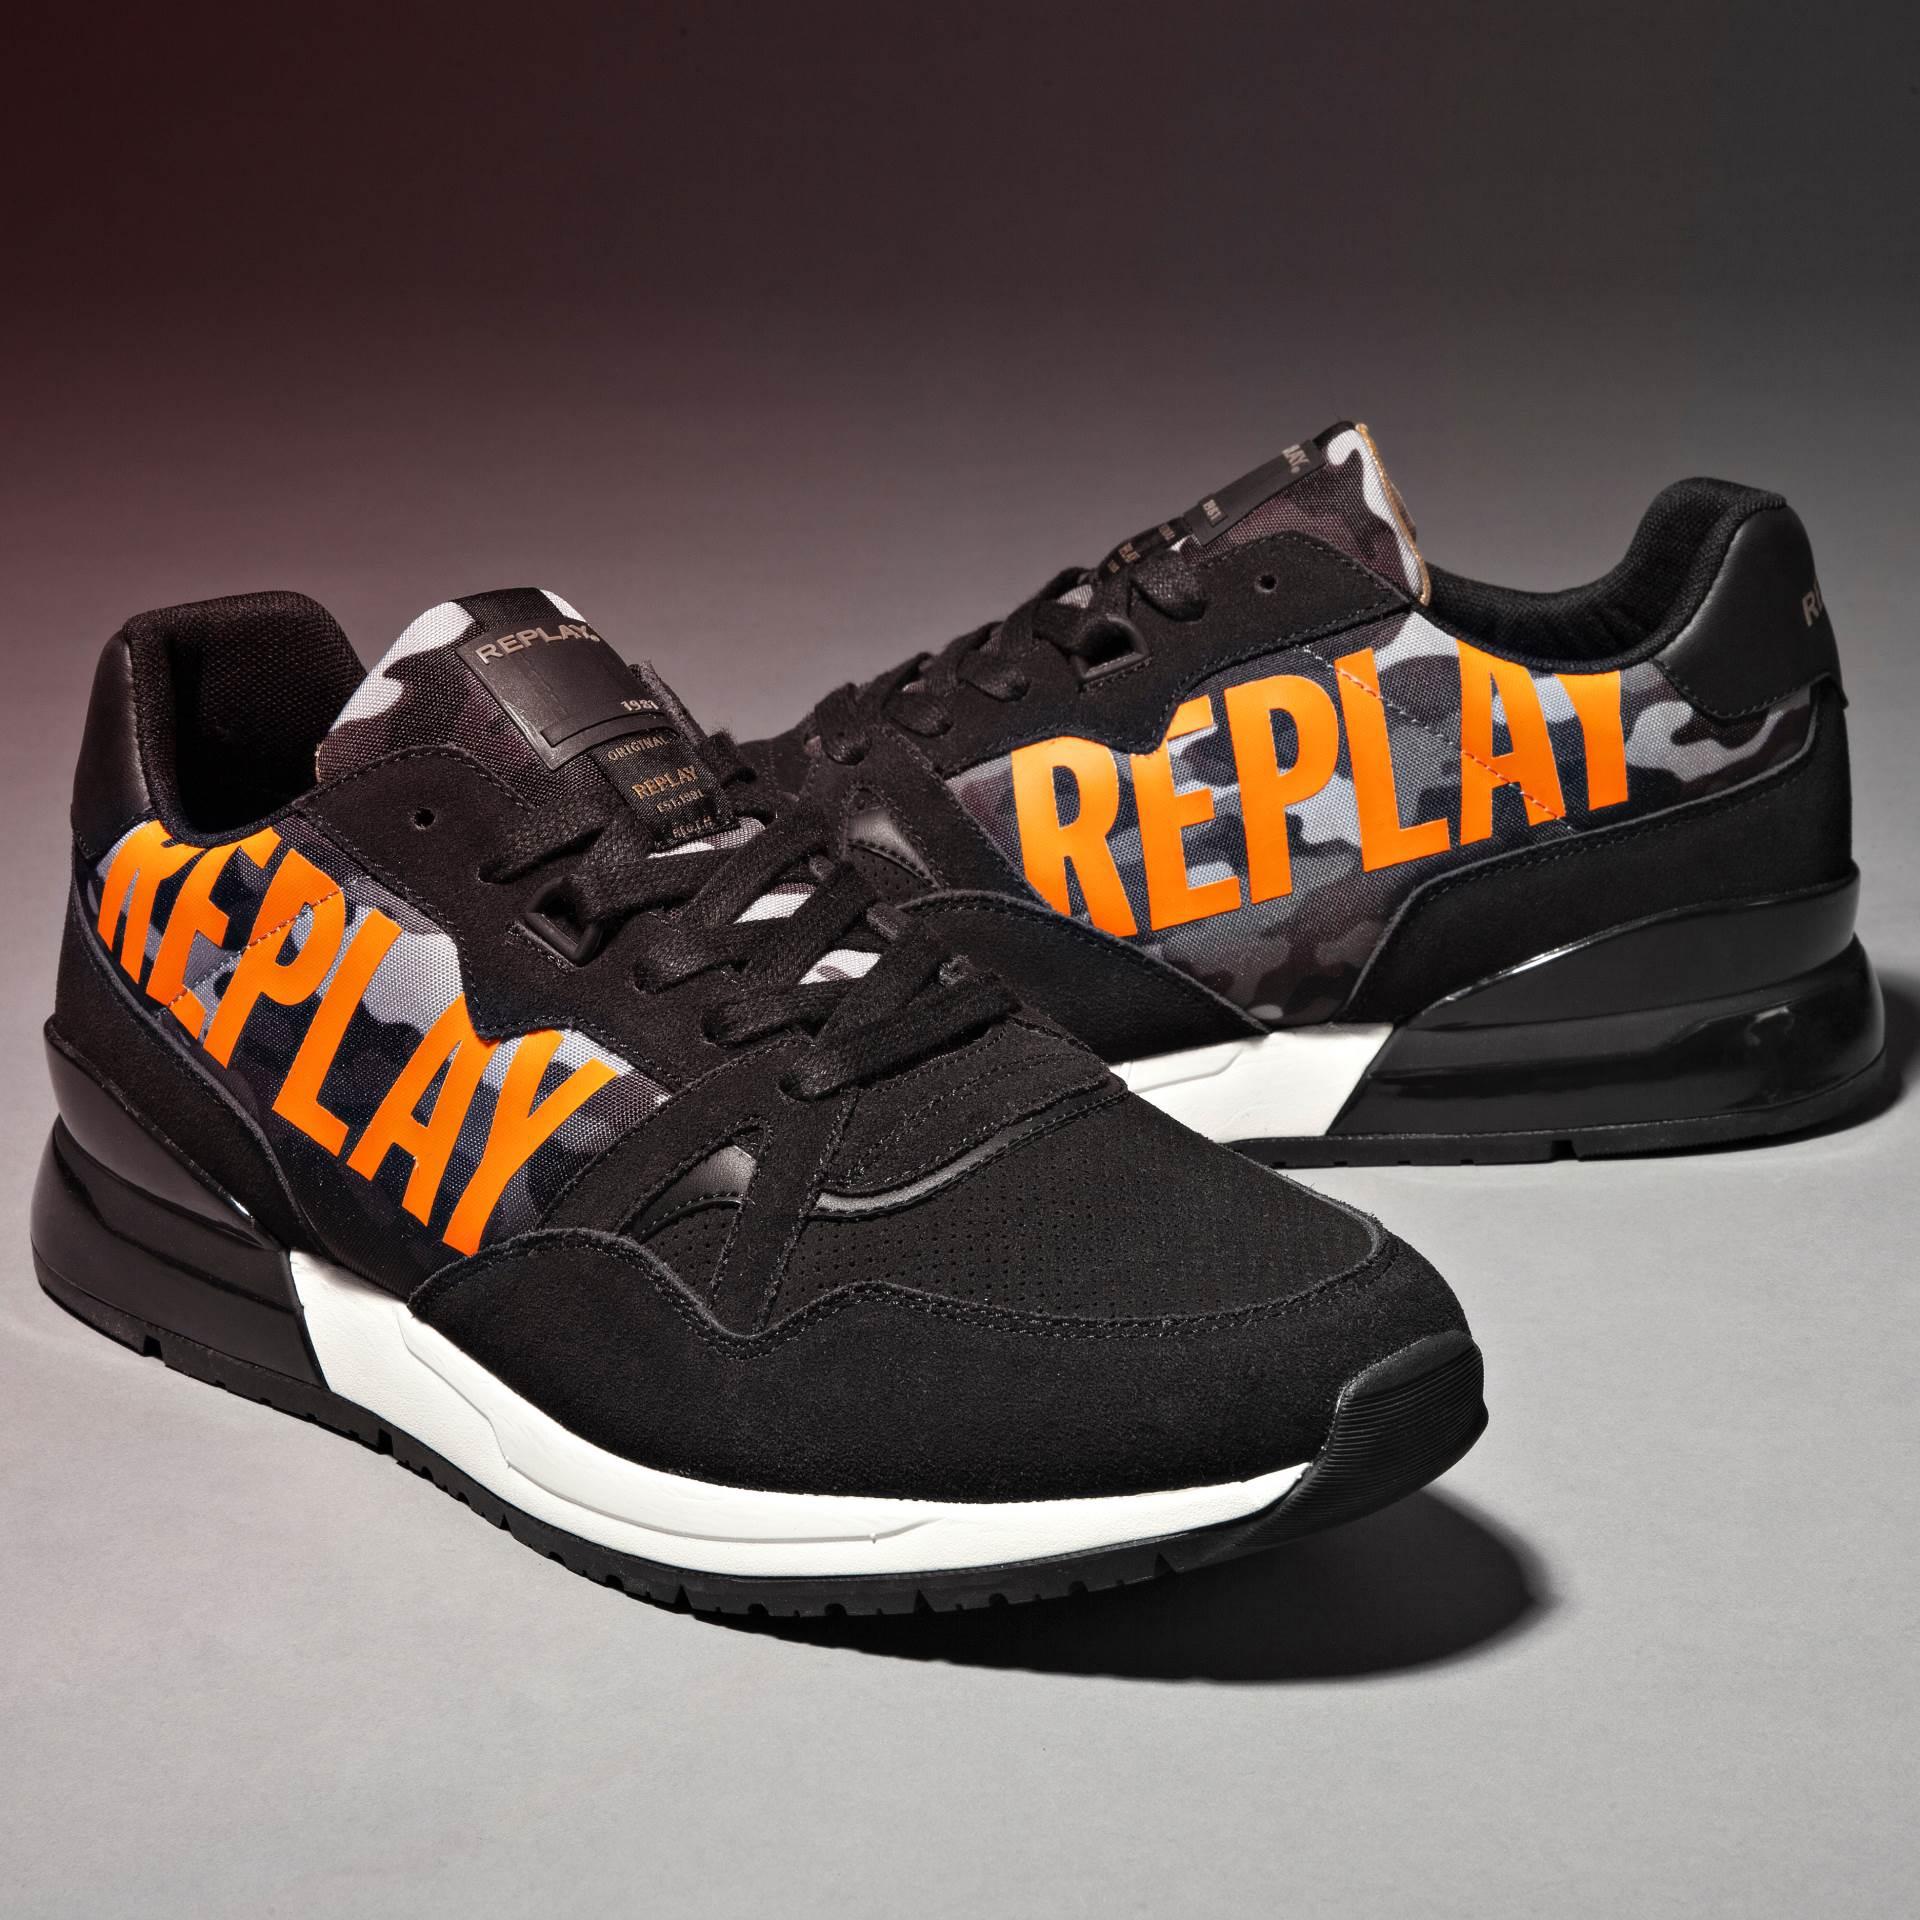 Replay Hrvatska, footwear kolekcija Jesen-Zima 2019